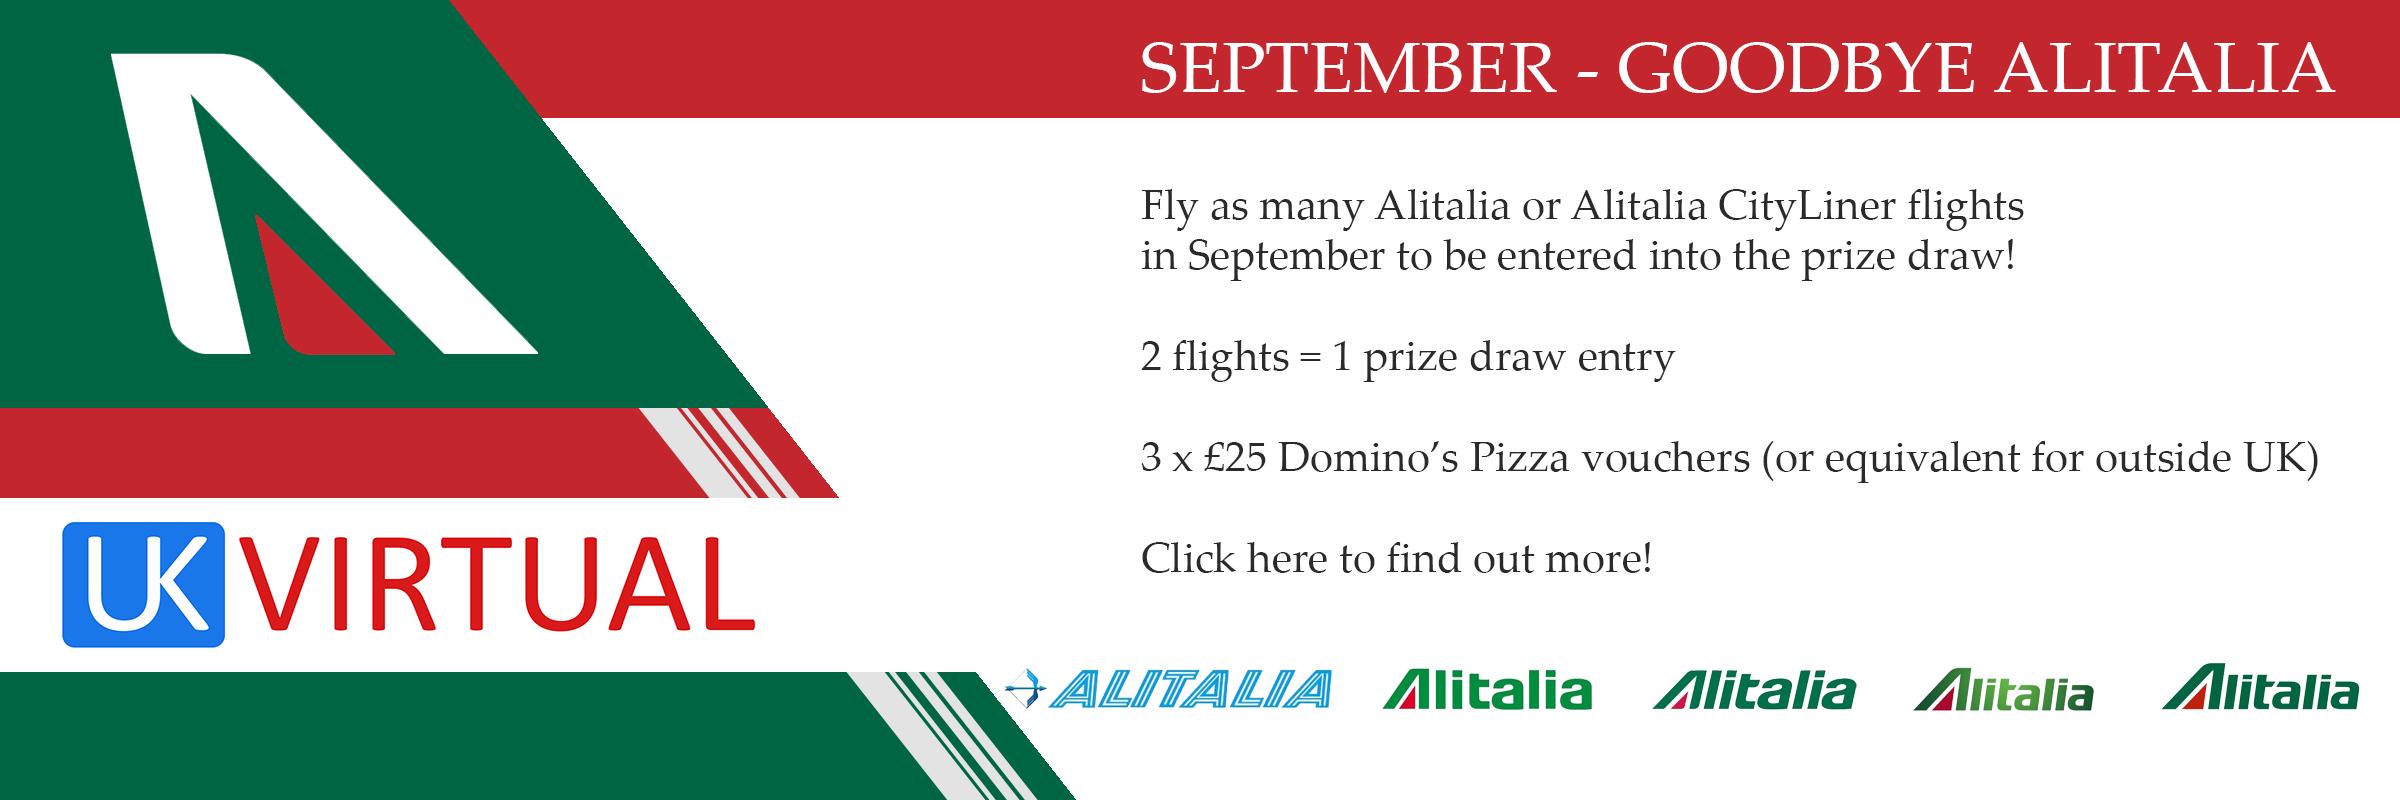 Goodbye Alitalia